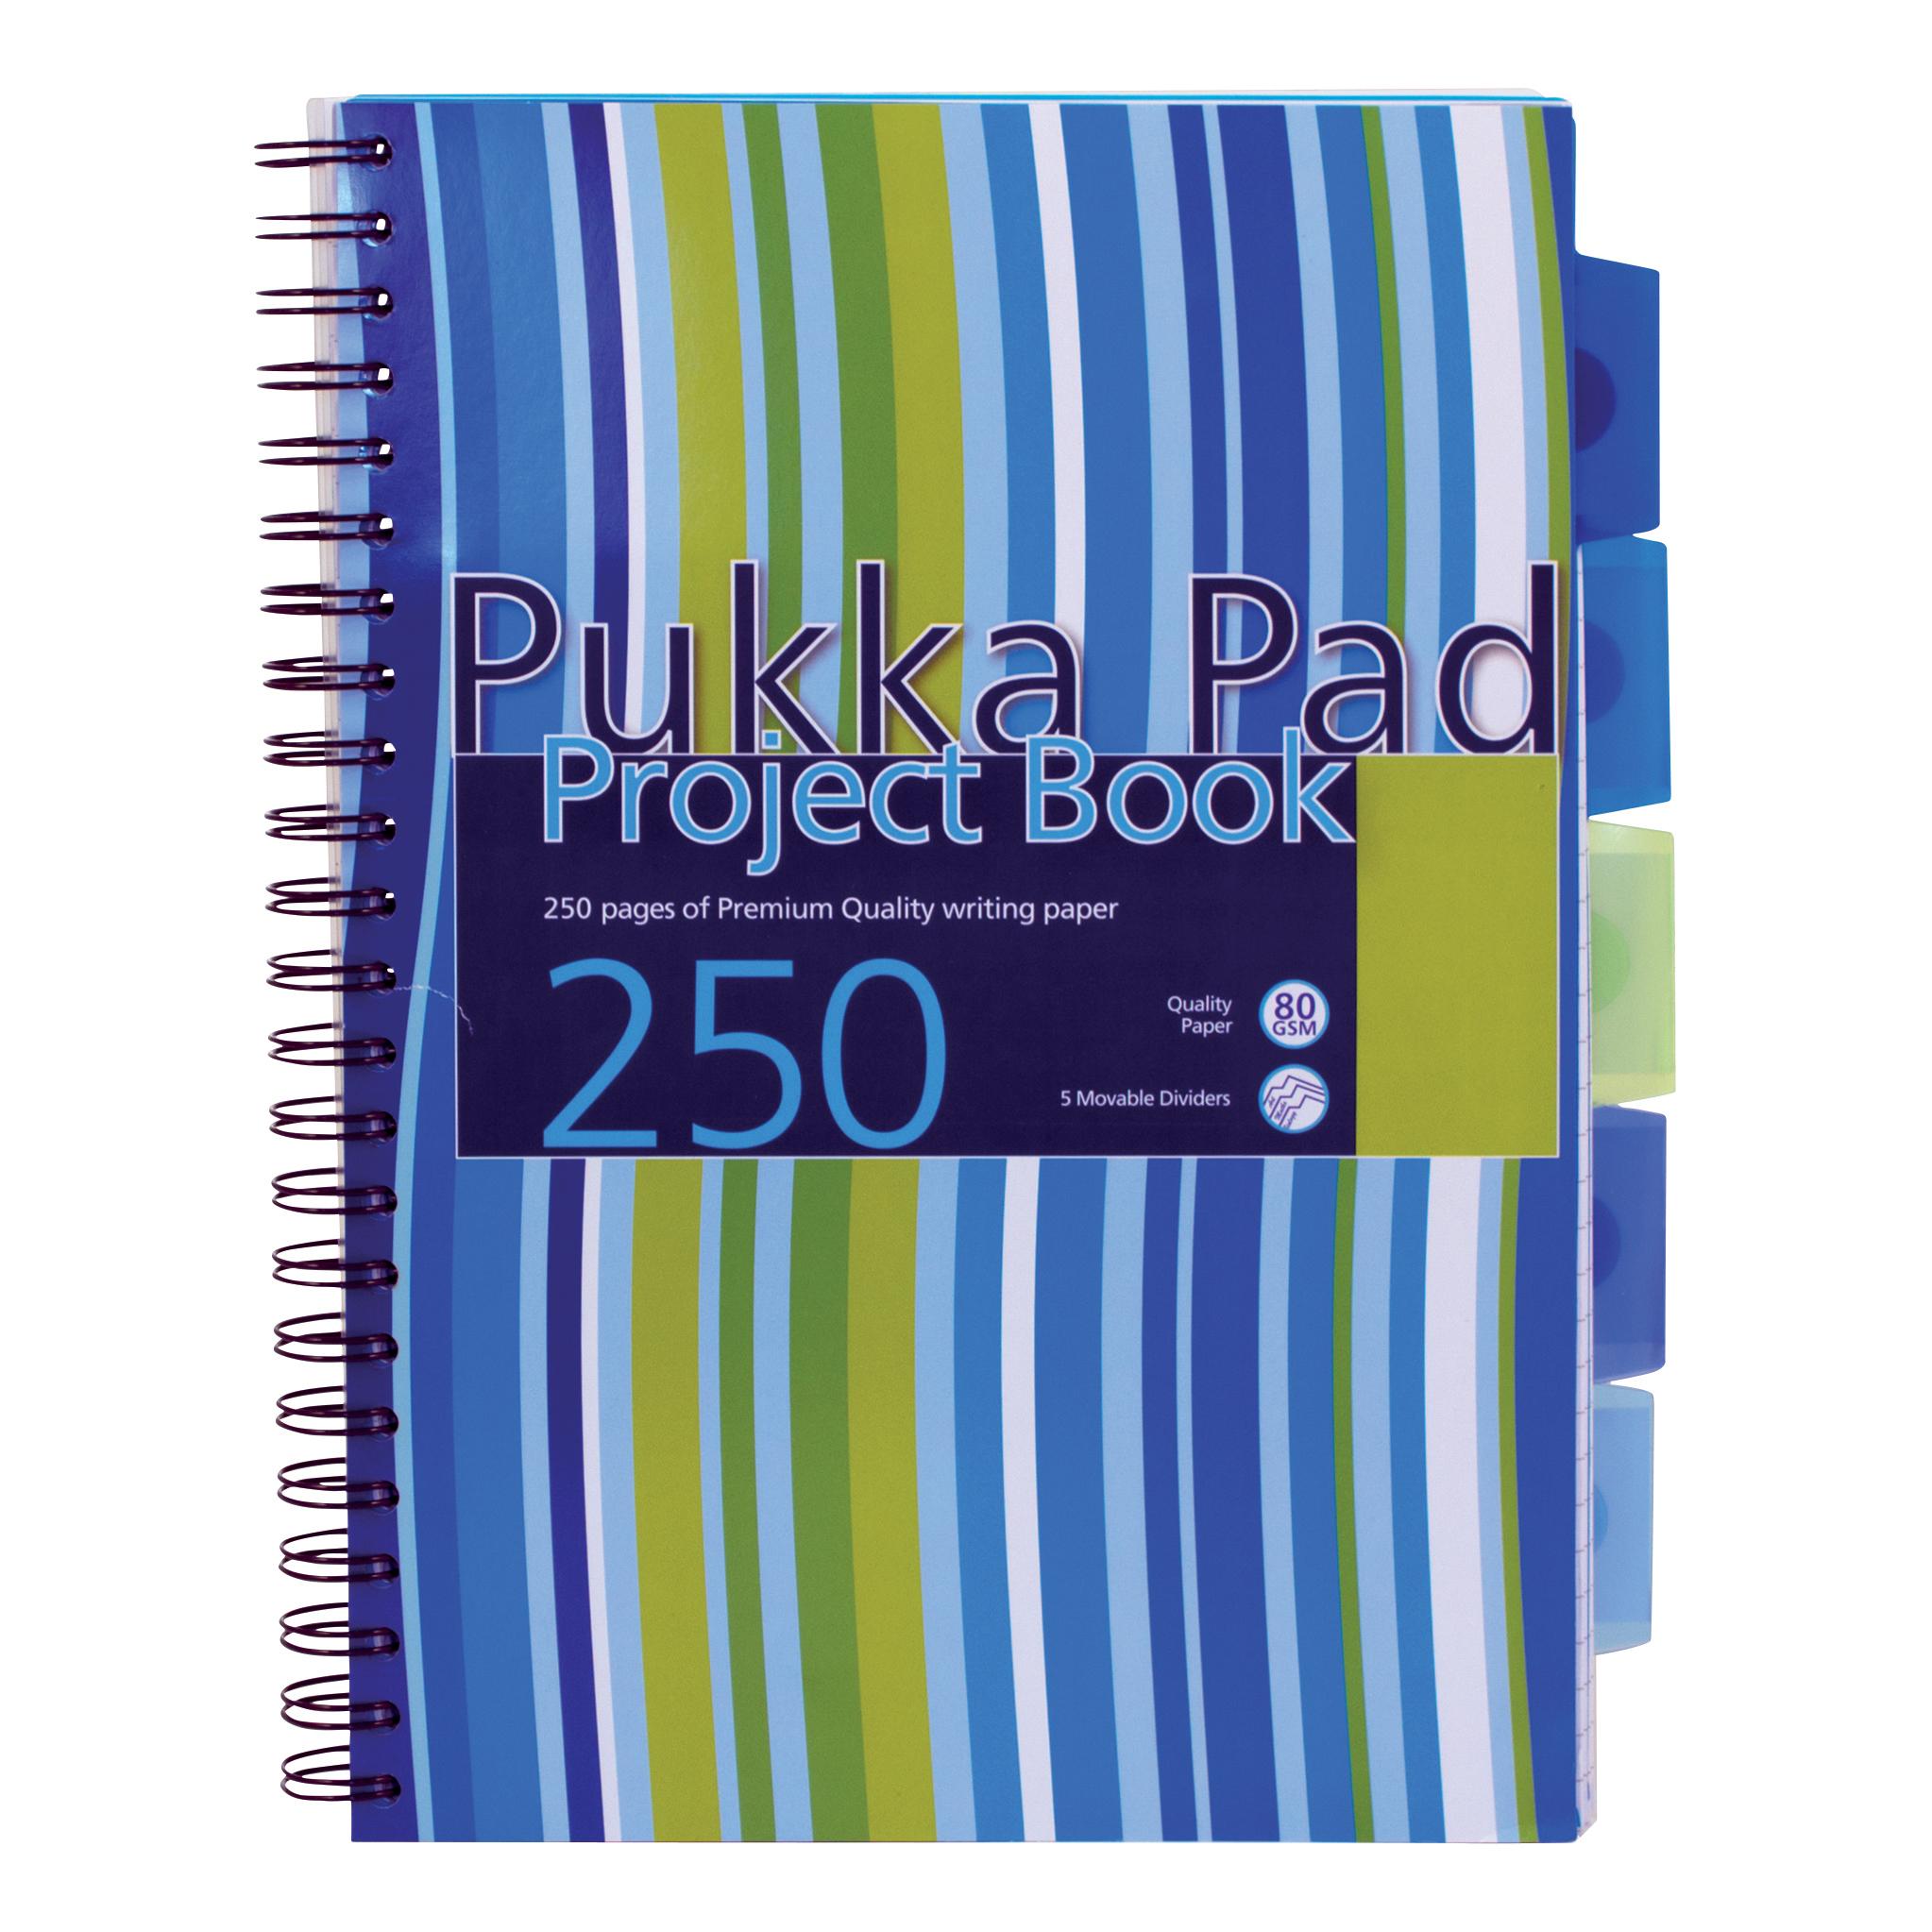 Pukka Pad Project Book Wirebound 5-Divider 250pp A4 Assorted RefPROBA4[Pack 3][Free Haribo Bag]Jul-Sep 19